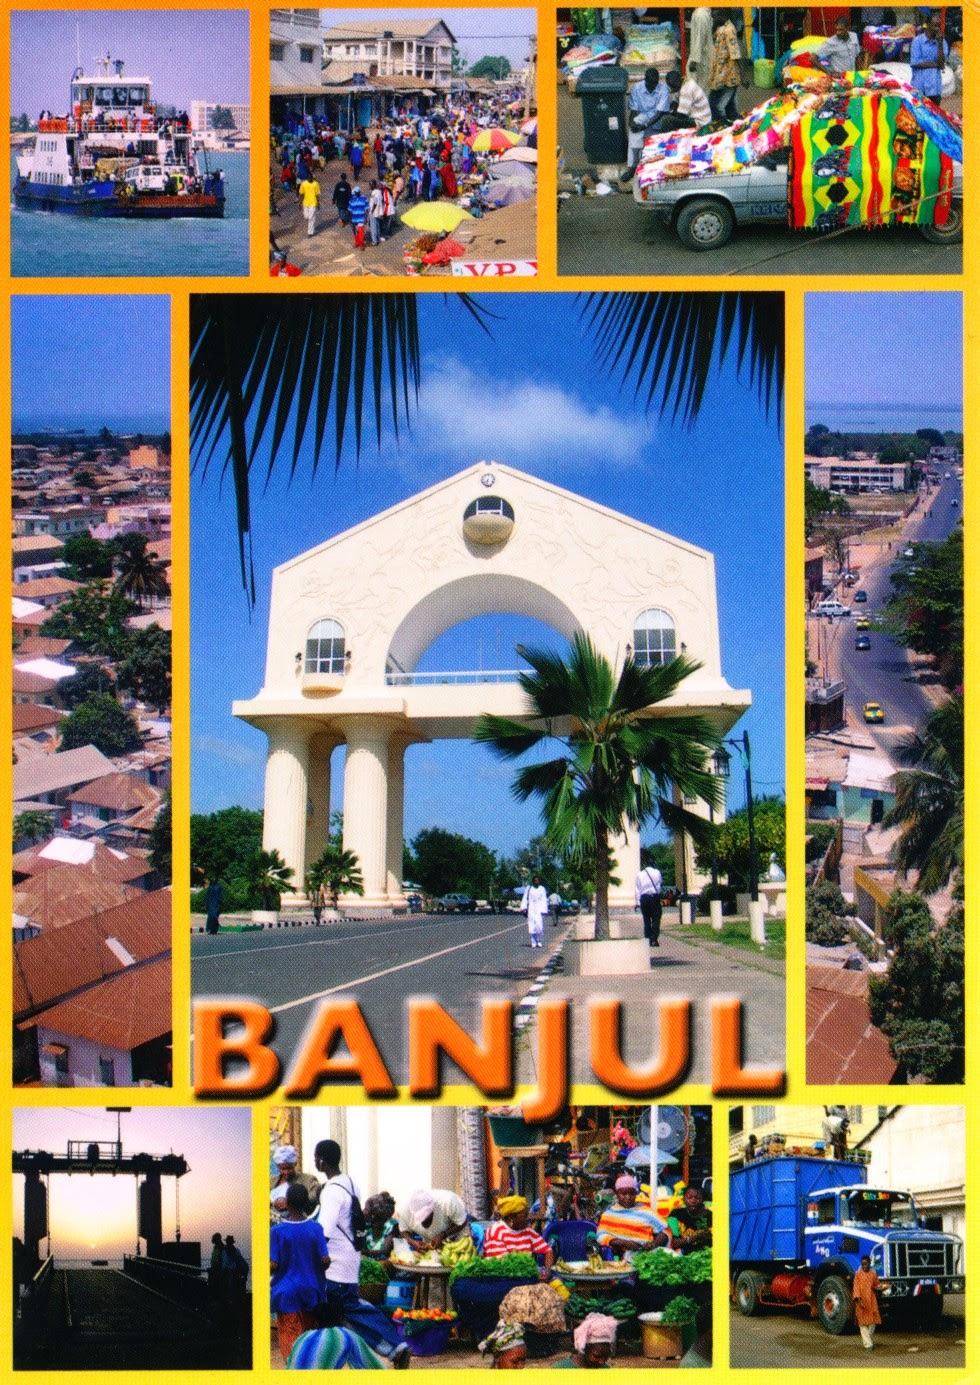 arch 22, banjul, gambia, market, postcard